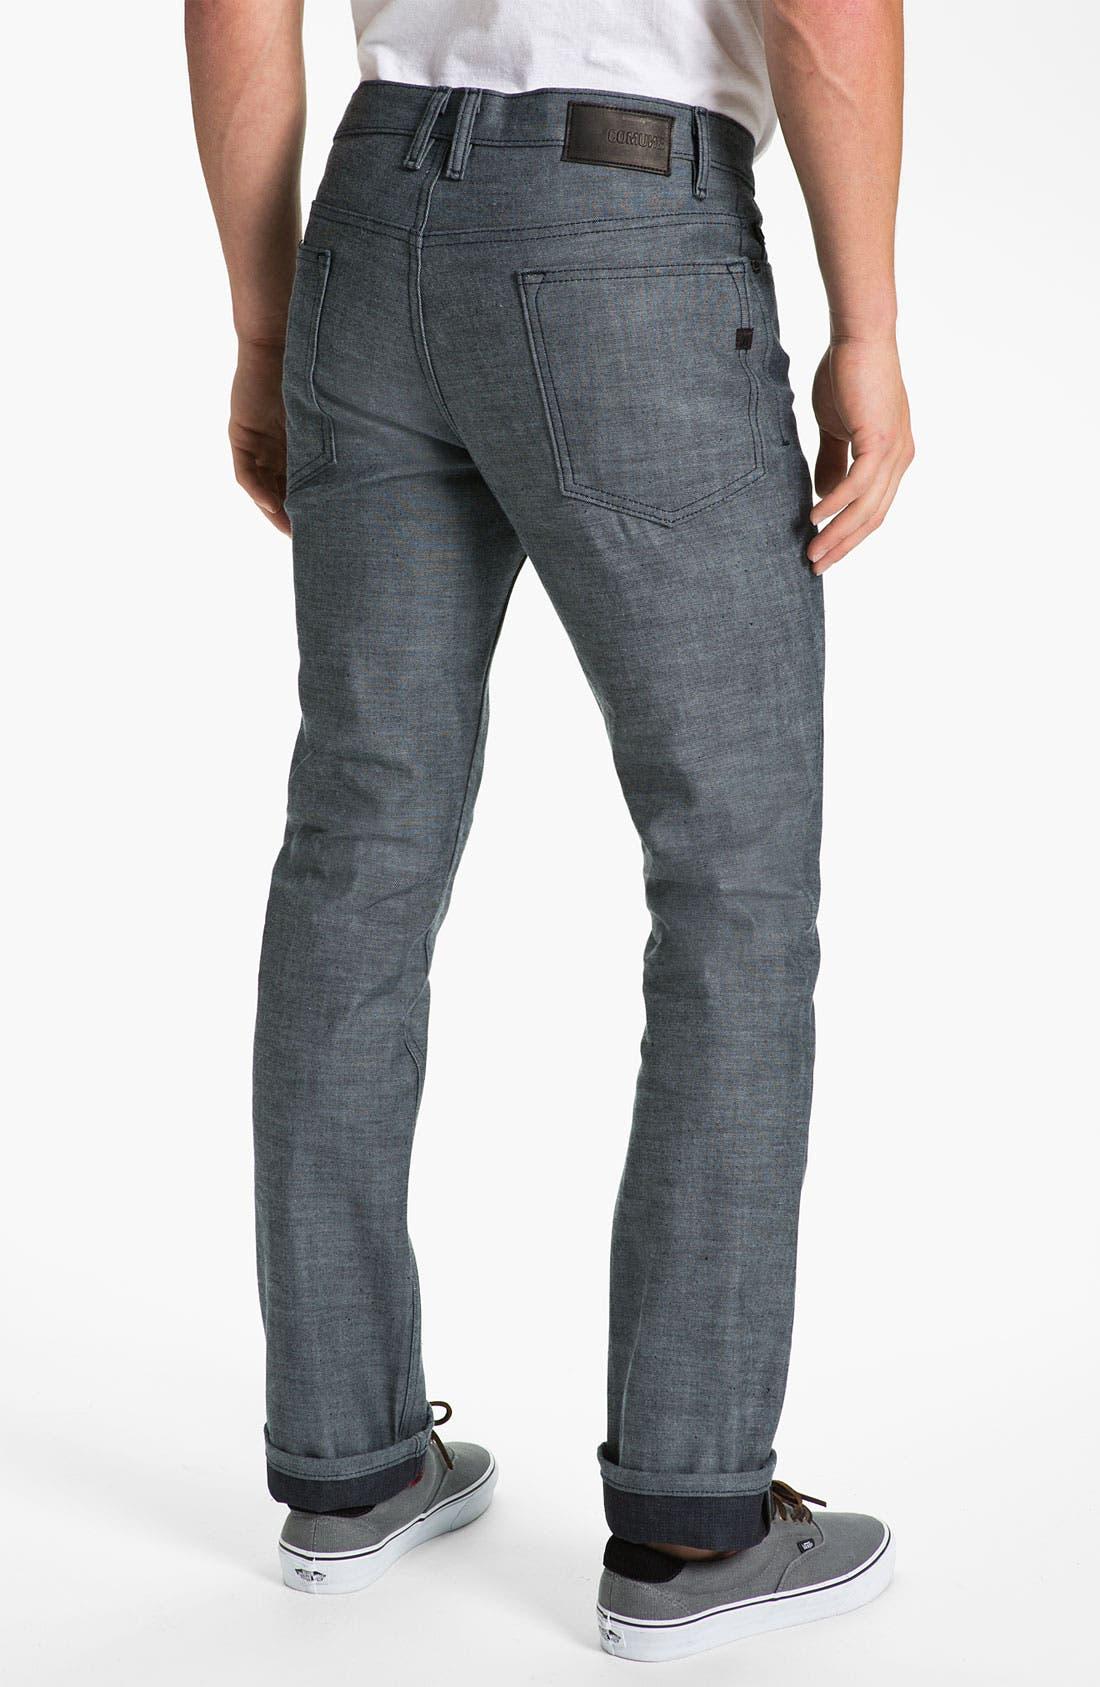 Main Image - Comune 'Ricky' Slim Straight Leg Jeans (Speckled Backside of Indigo)